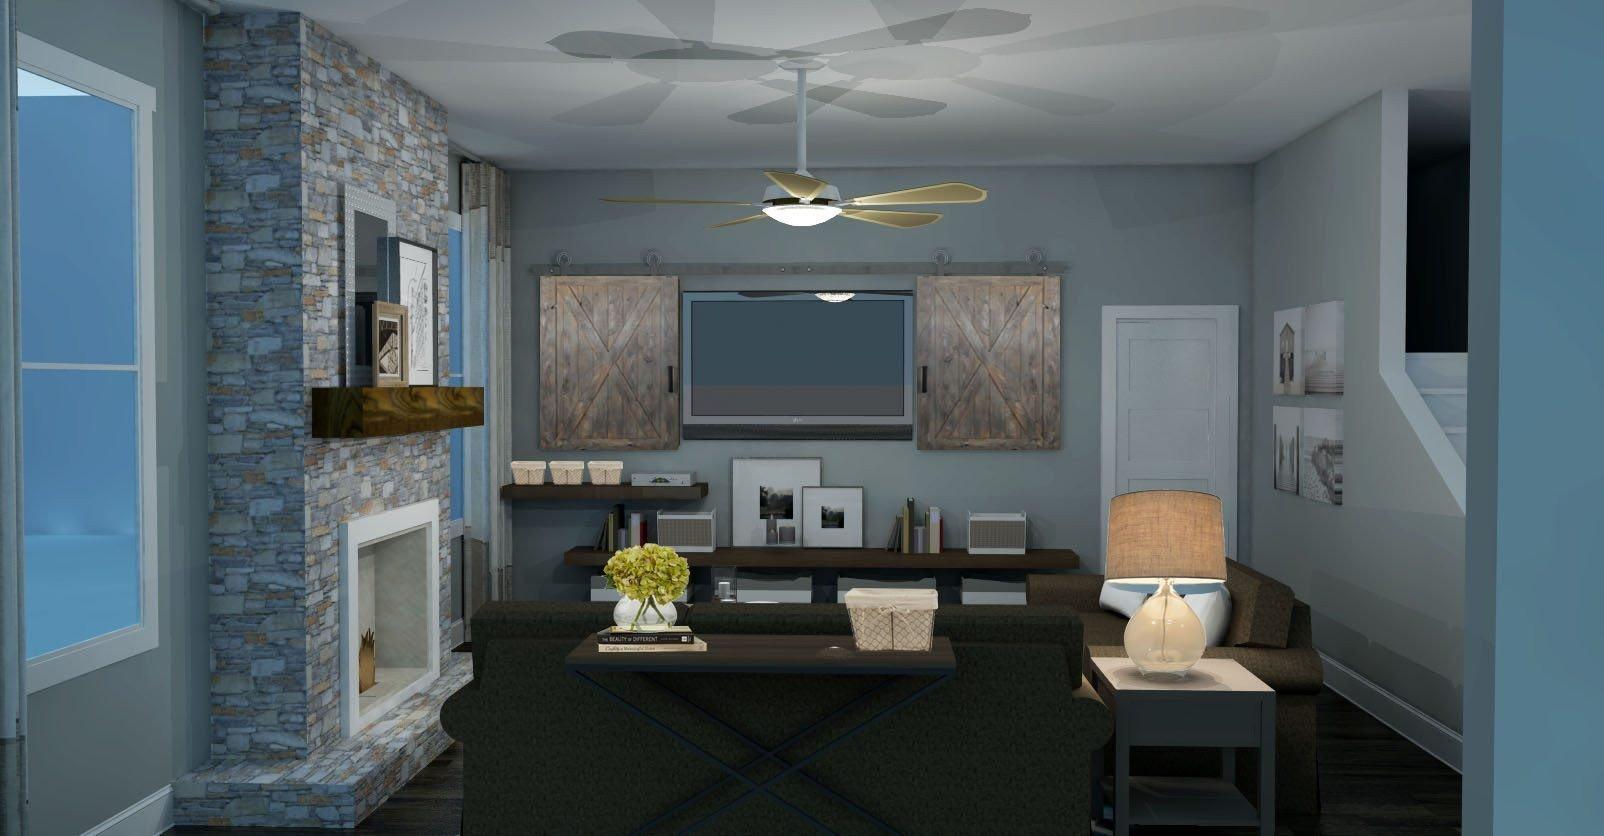 Modern Rustic Living Room Decorating Ideas Awesome Modern Rustic Living Room Design